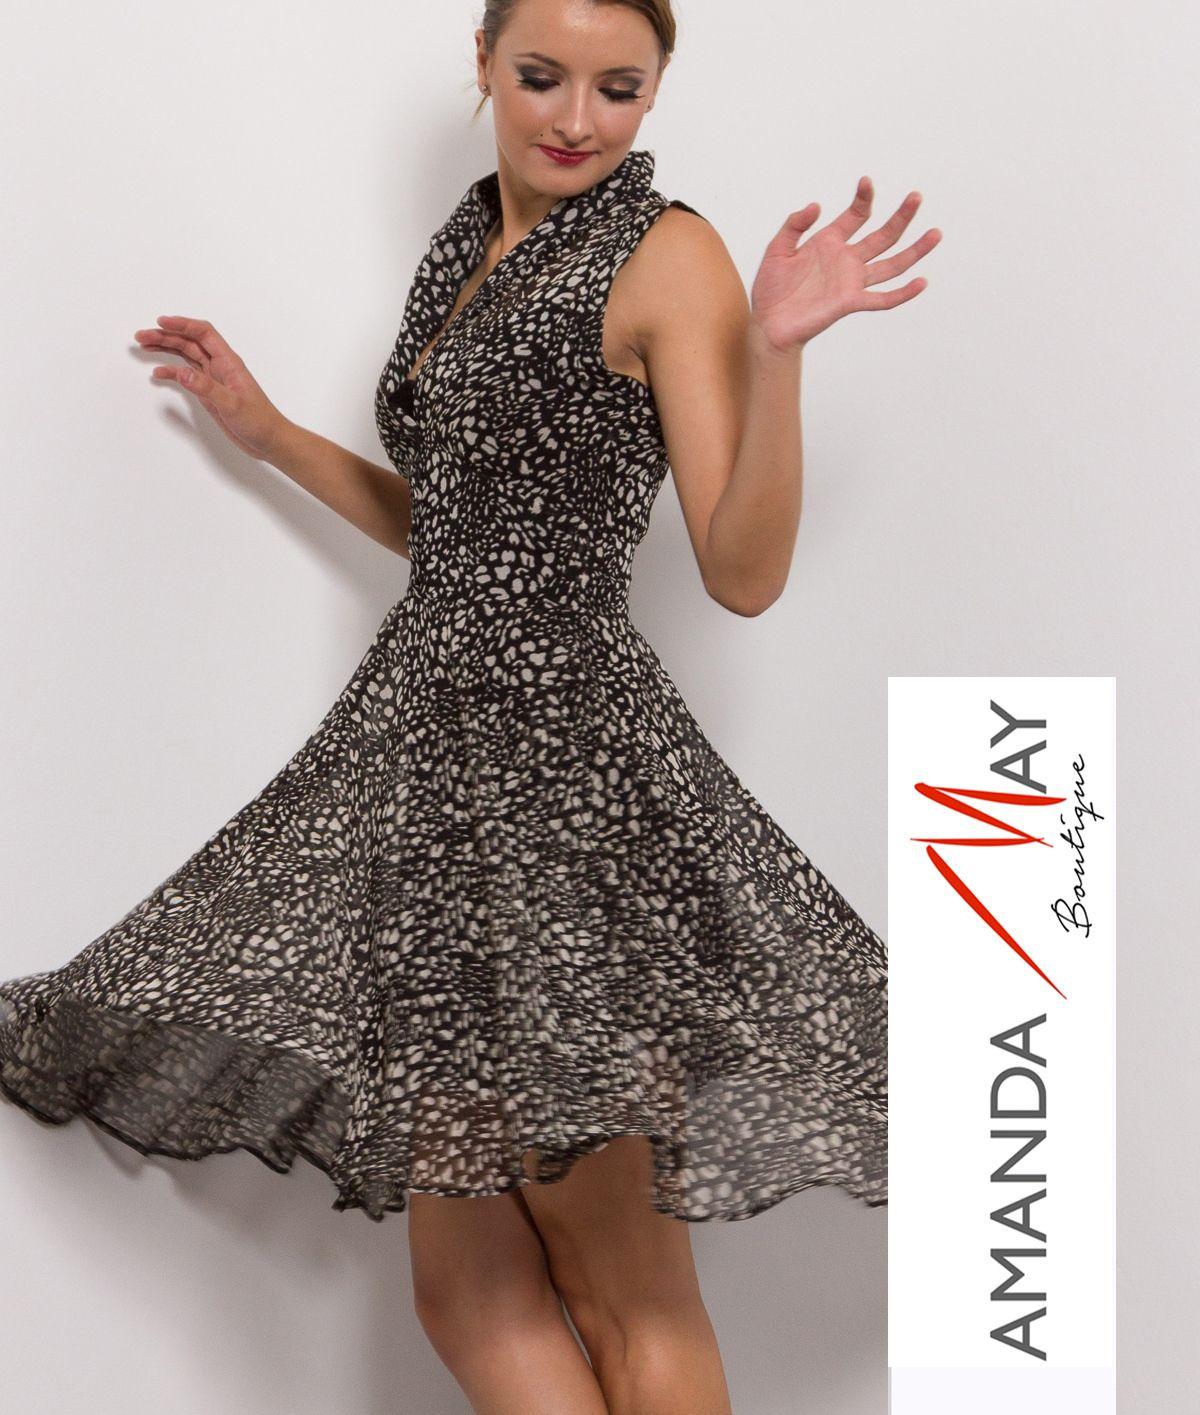 Amanda May Swing Panel Drop Waist Dress - getthisgetthis